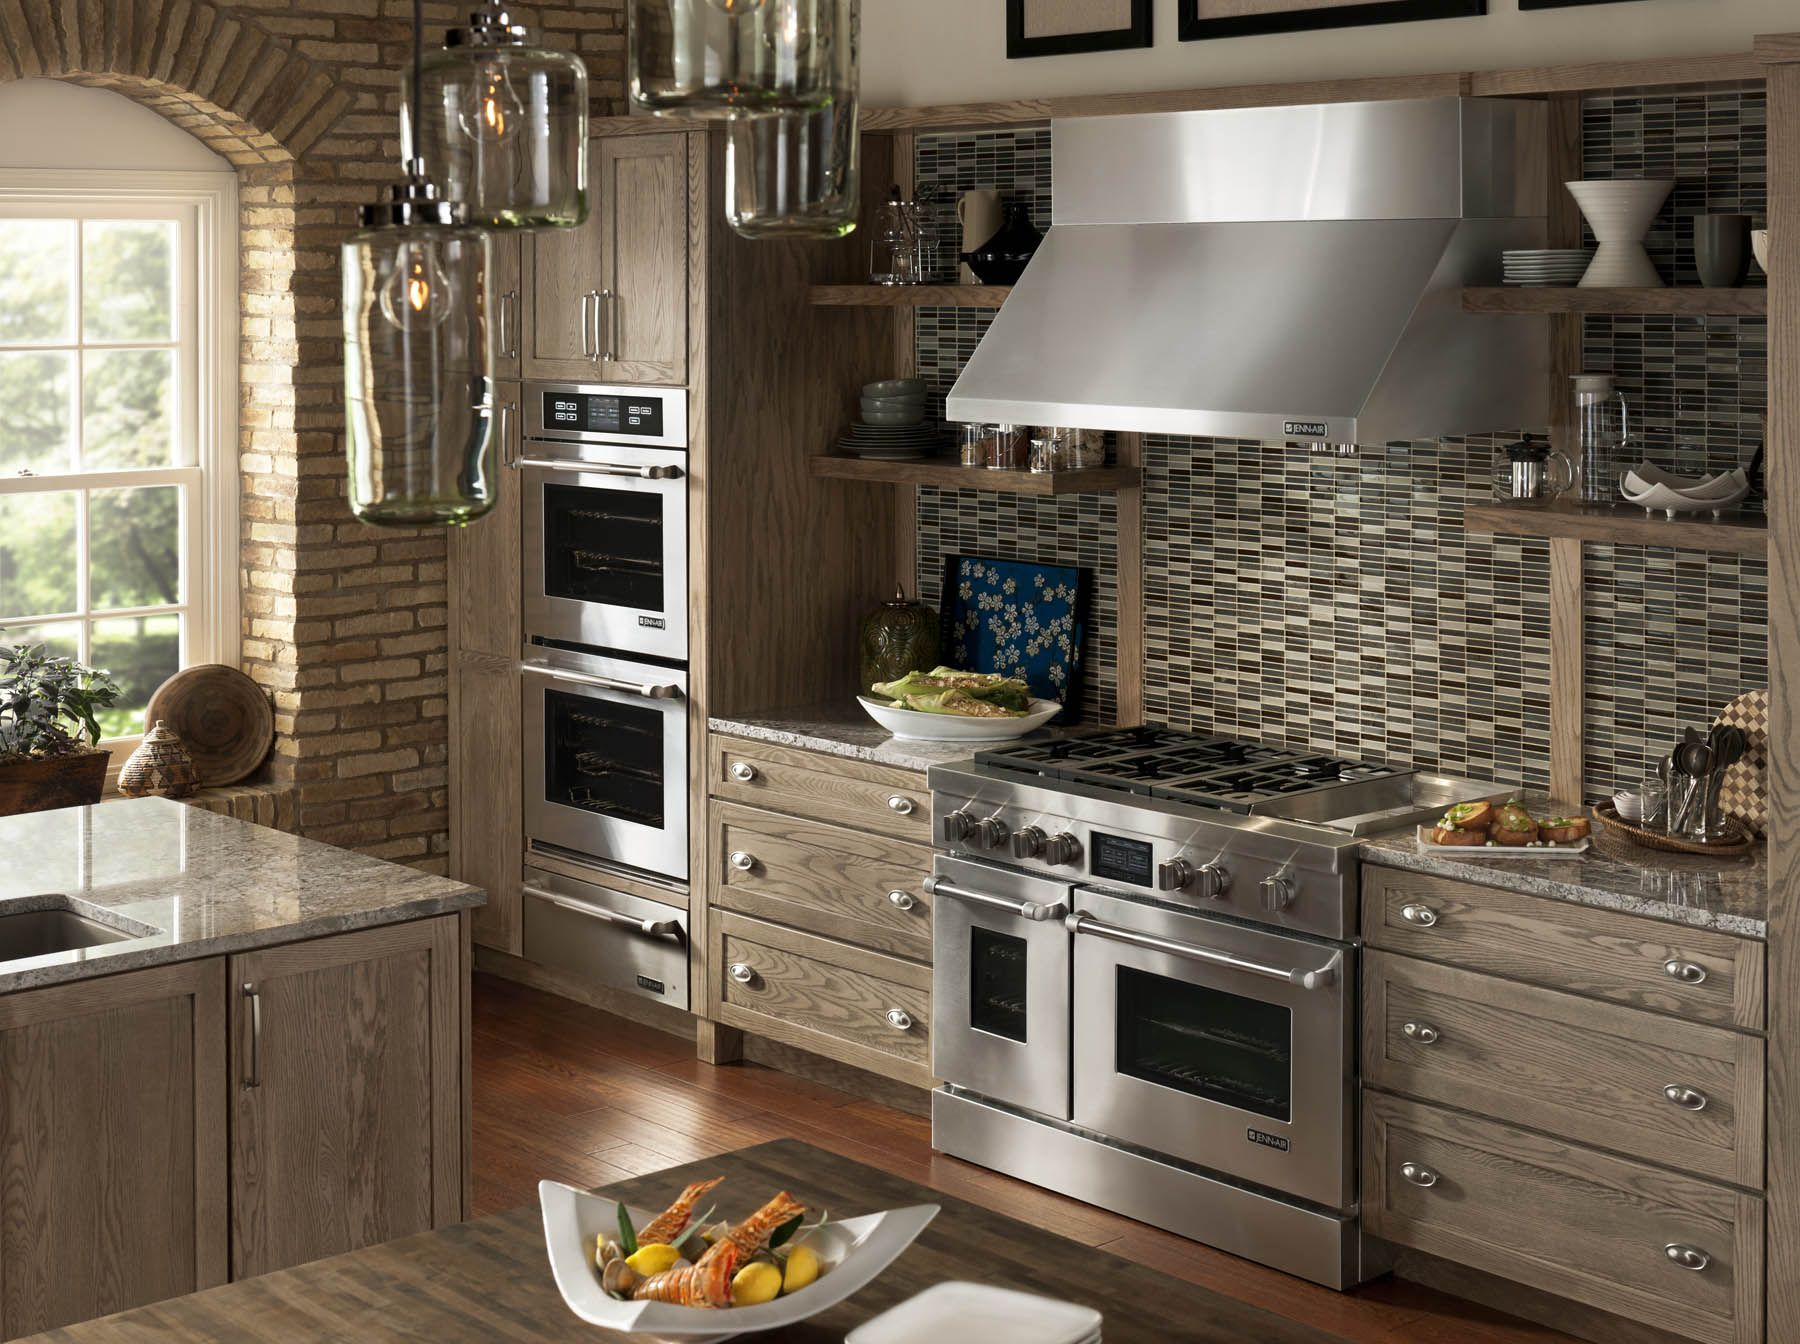 A beautiful Jenn-Air kitchen   Traditional kitchen ... on Traditional Kitchen Wall Decor  id=78930